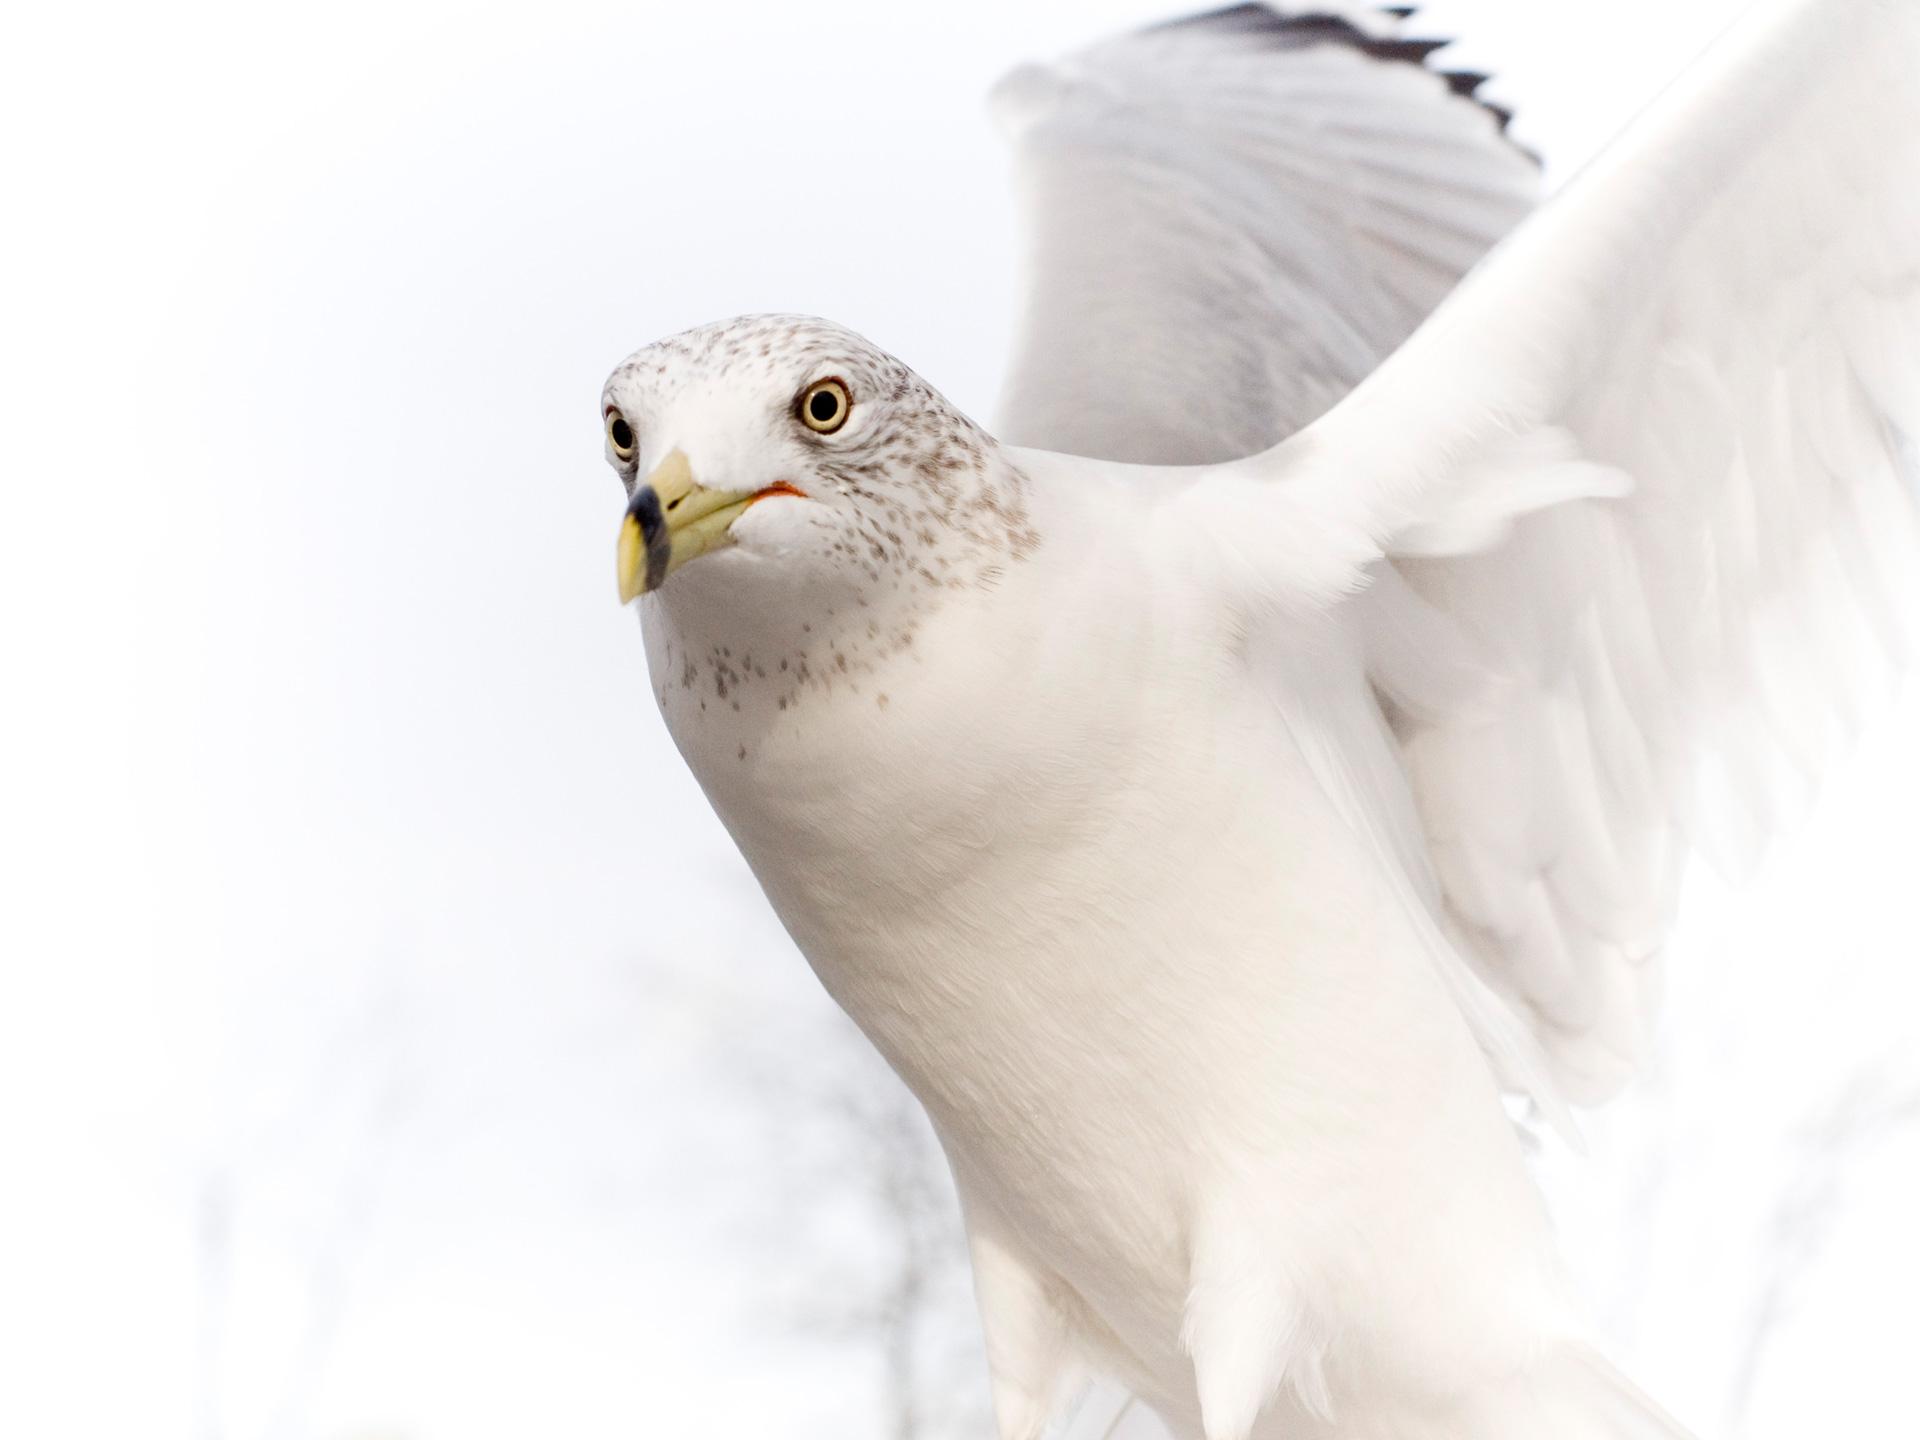 Bird Wallpapers, Photos And Desktop Backgrounds Up To 8K